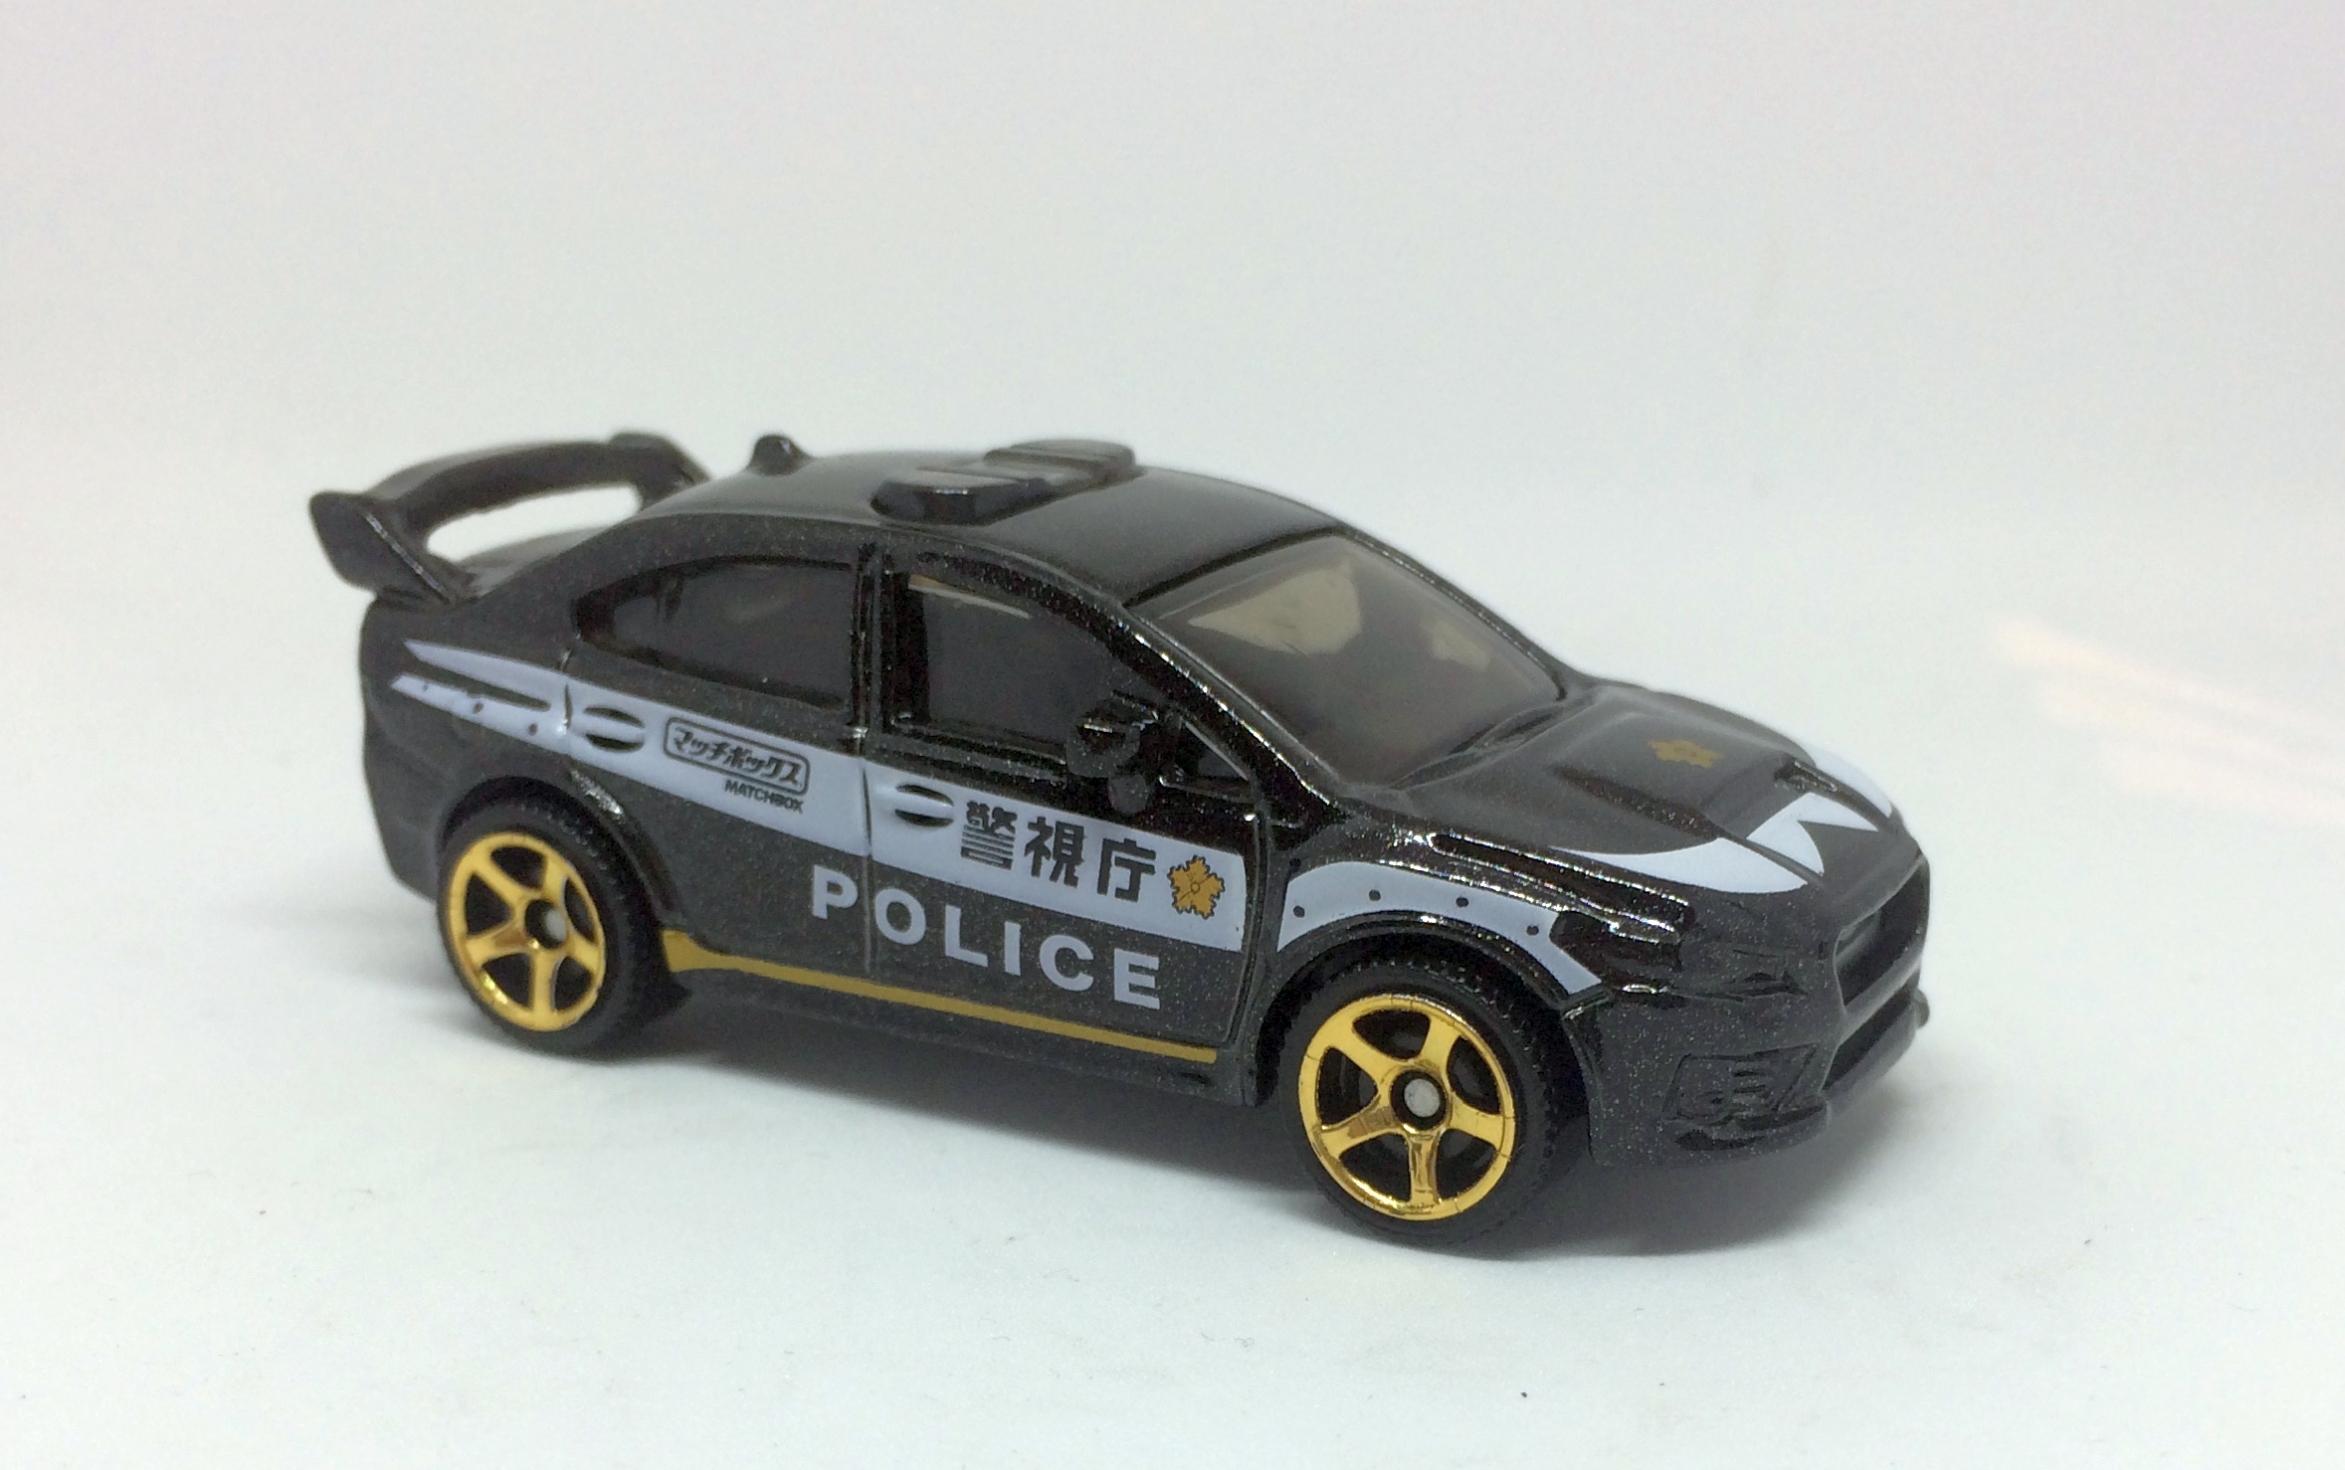 img-2092.JPG